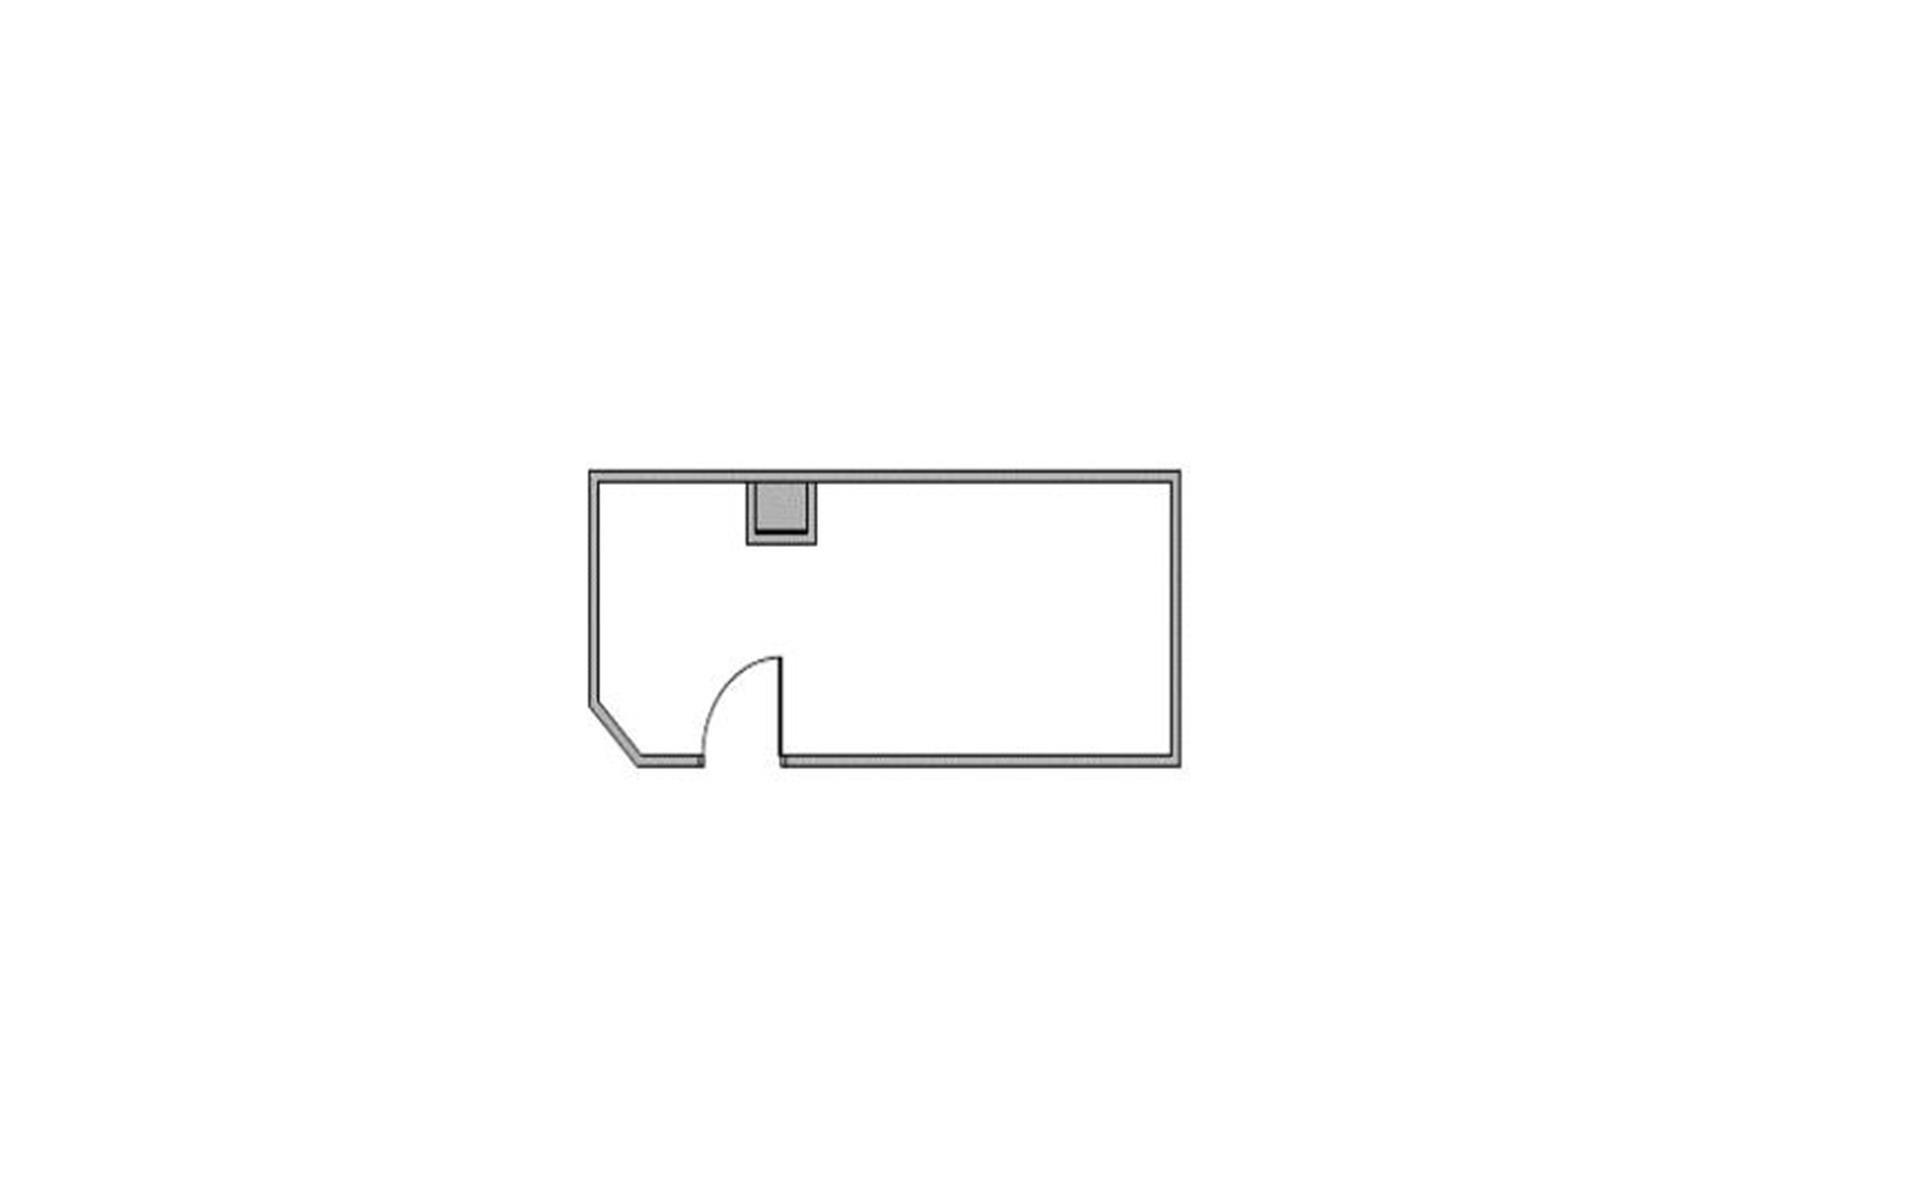 Boxer - One Century Centre - Team Space | Suite 389